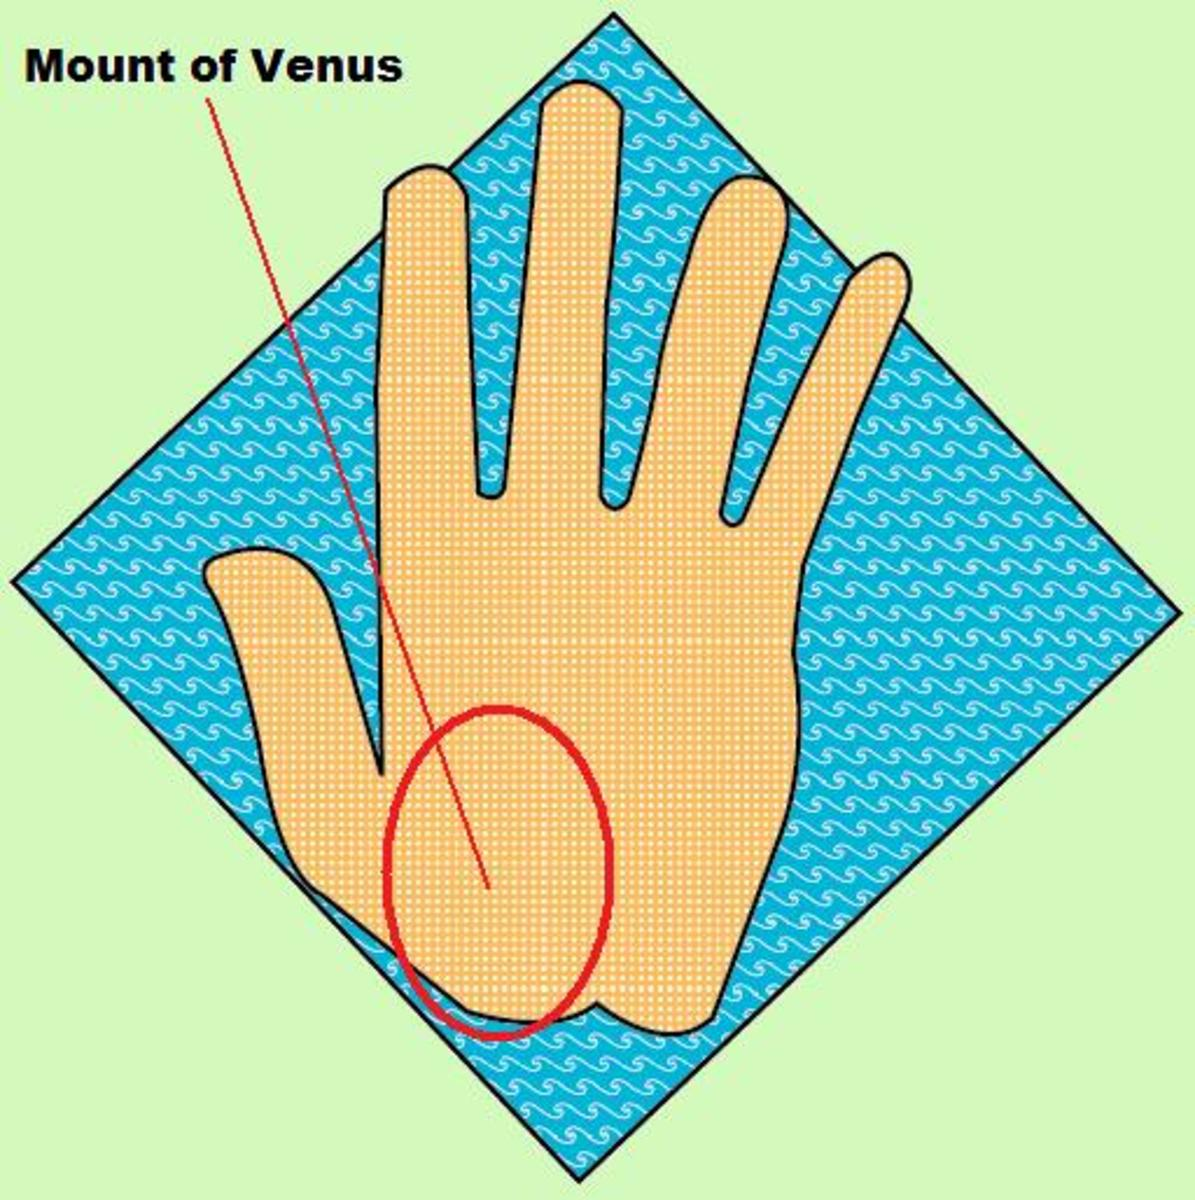 Venus mount below thumb